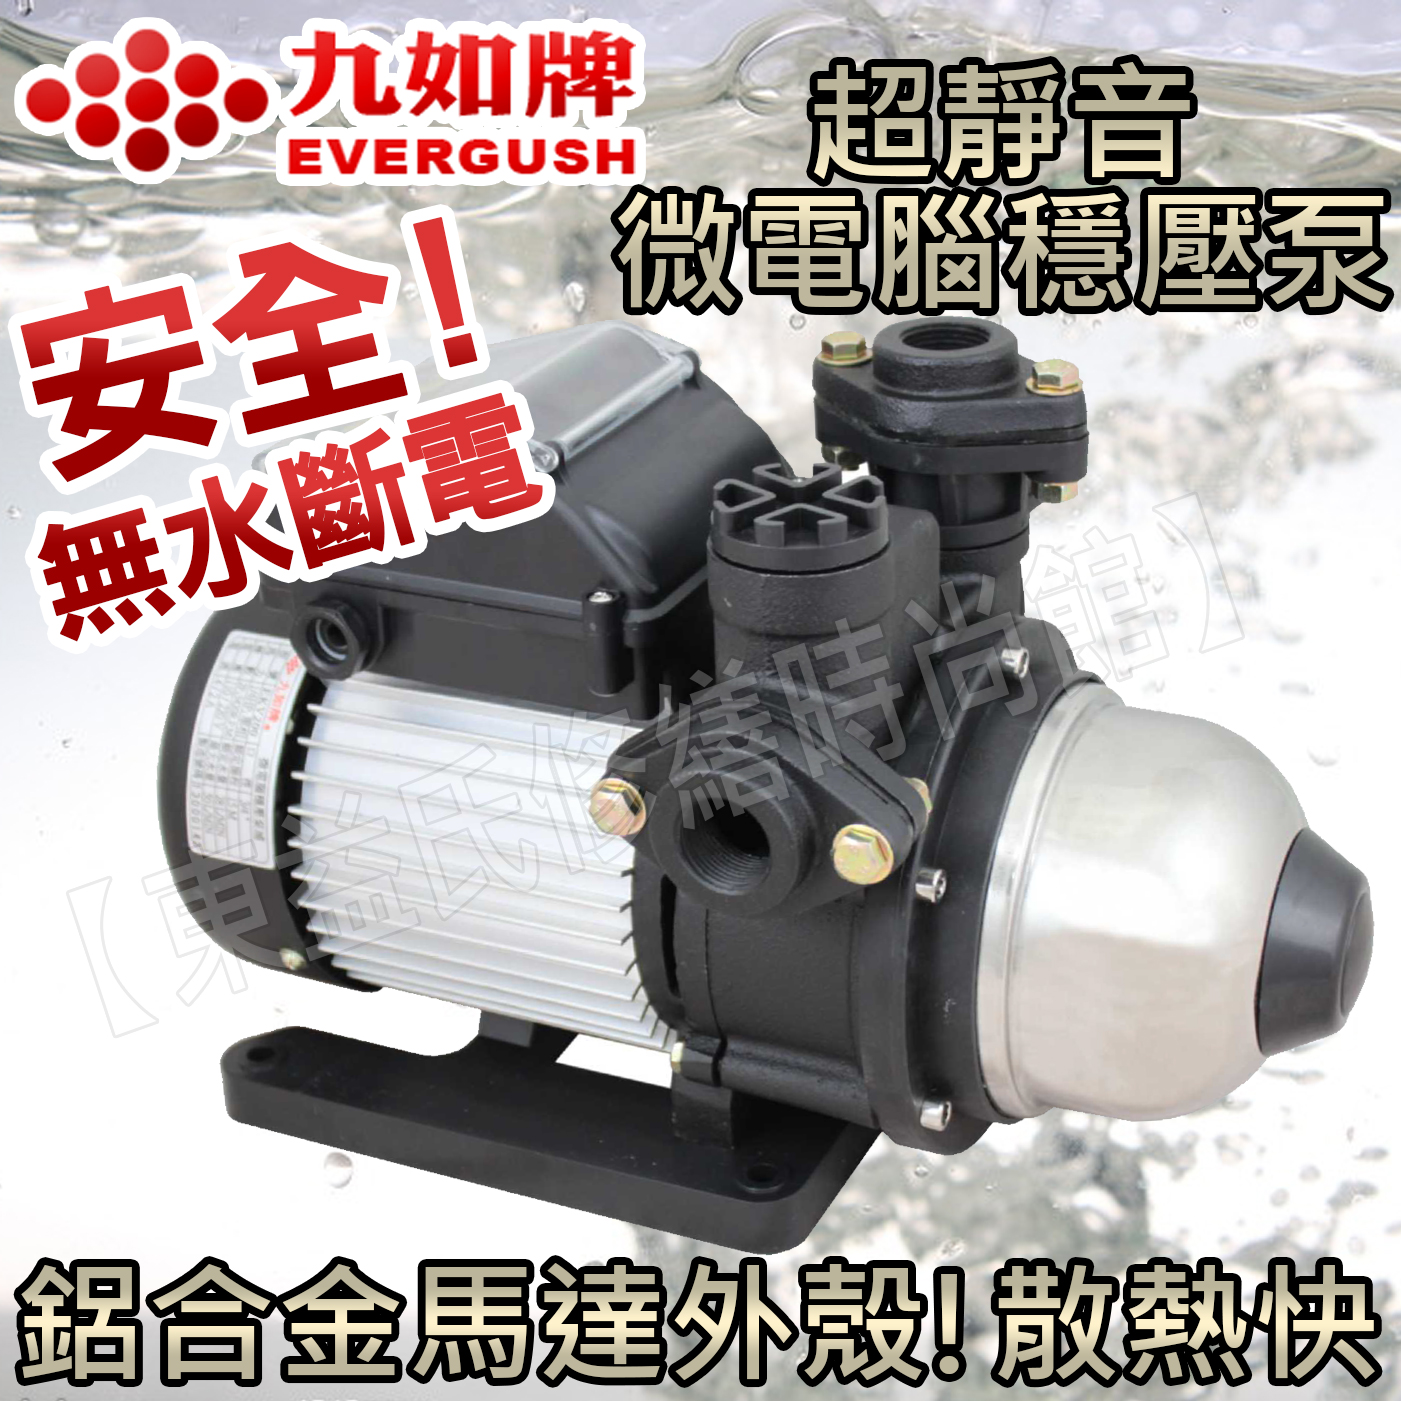 EKV400 九如牌 1/2HP 鋁合金 微電腦穩壓泵110V/220V通用 無水斷電【東益氏】售 大井牌